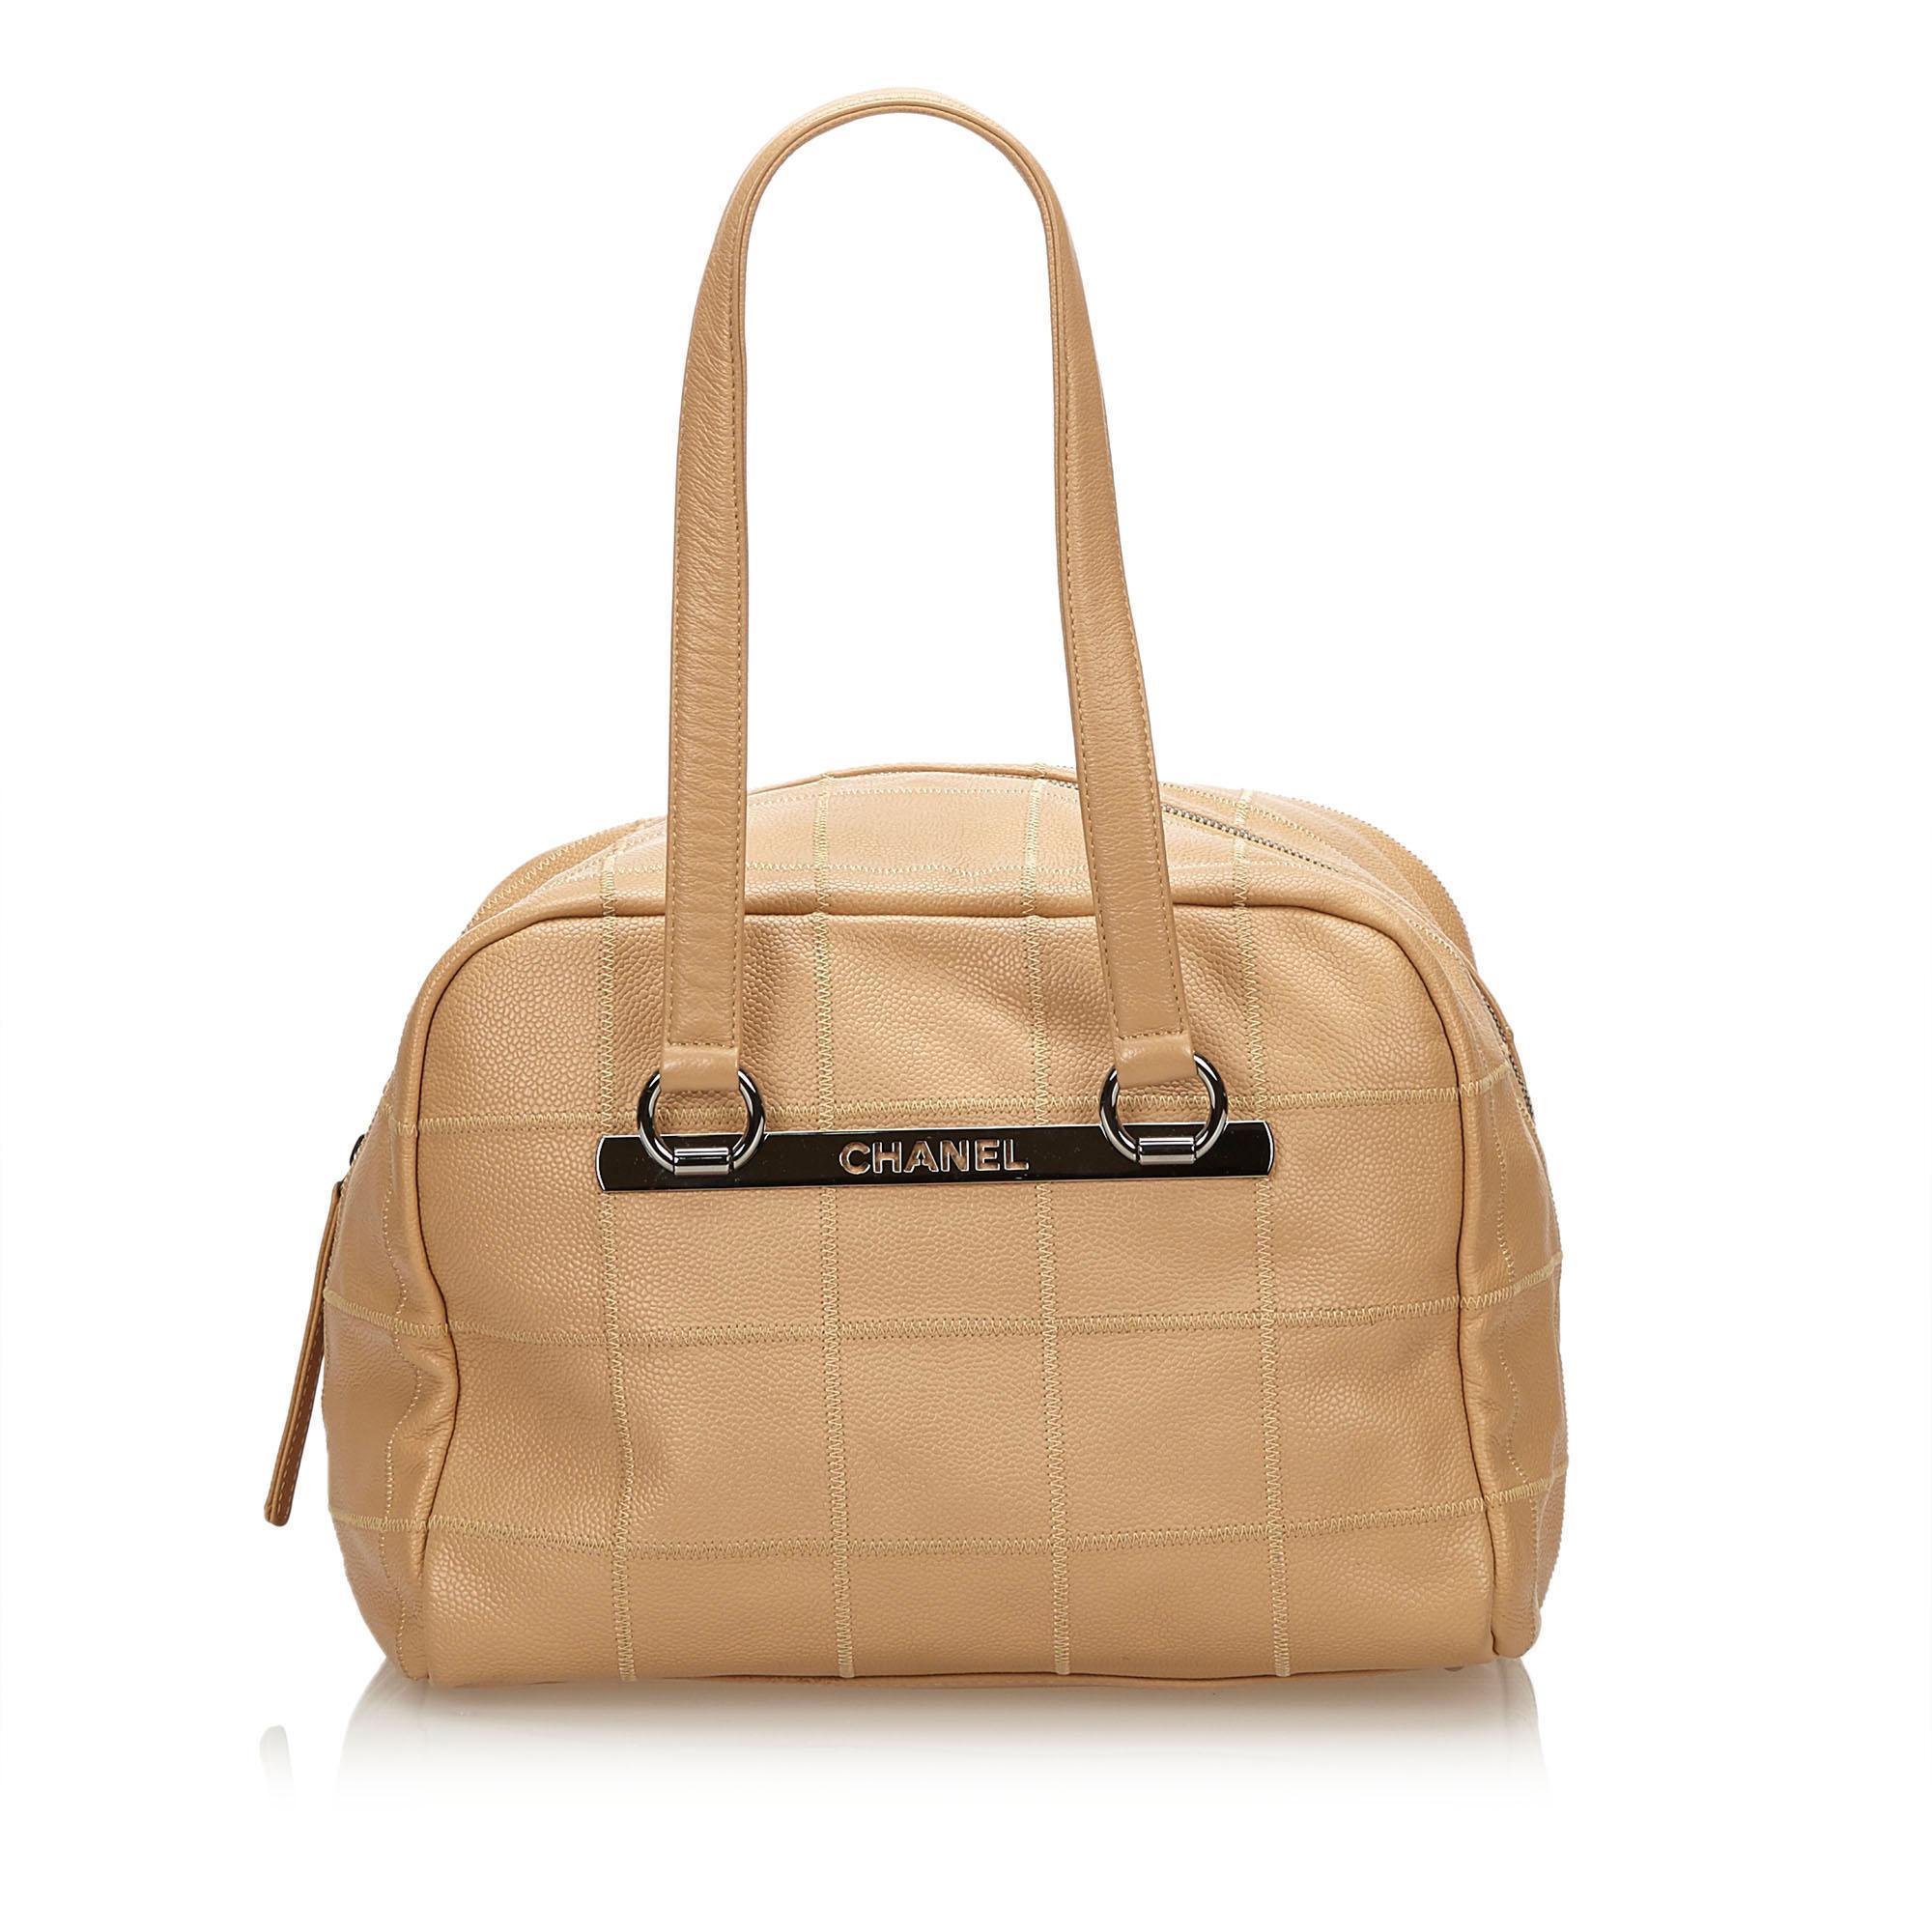 Chanel - Brown Choco Bar Caviar Leather Shoulder Bag - Lyst. View fullscreen 6aac182636682